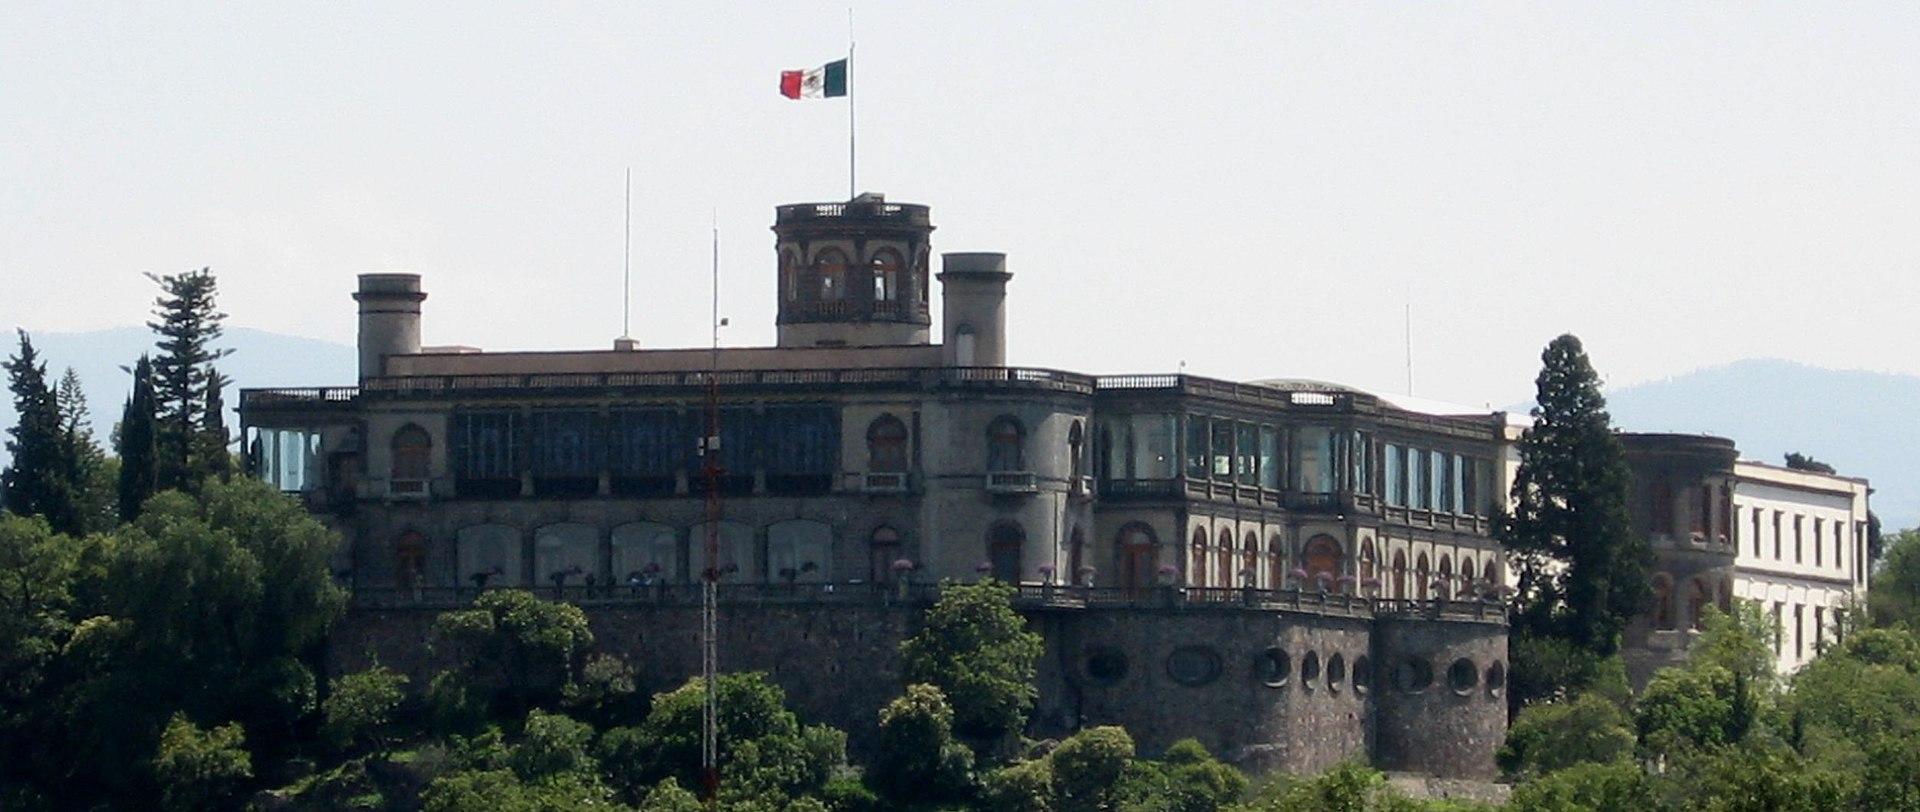 Castillo de chapultepcec.jpeg